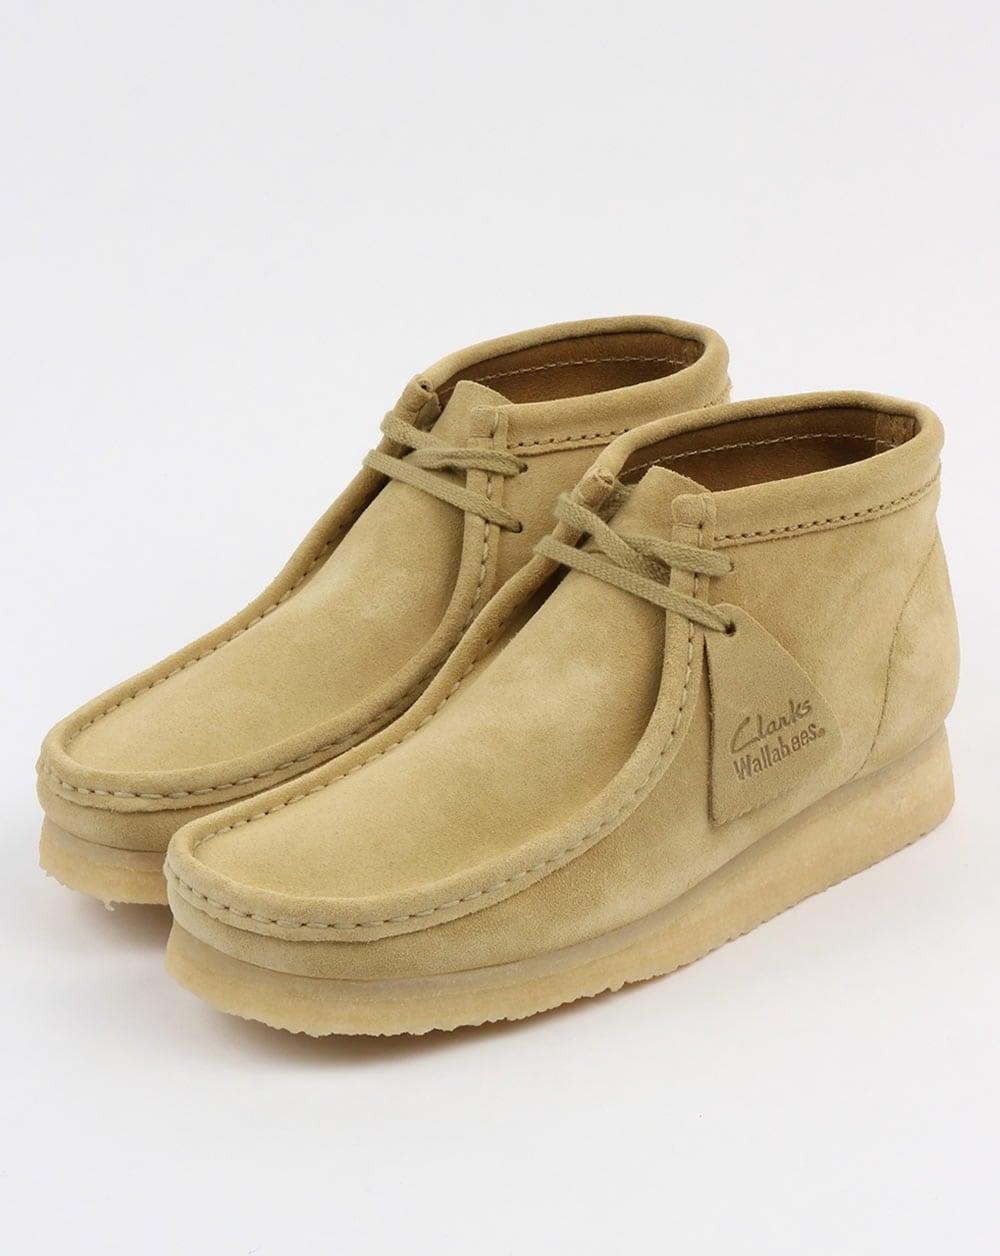 Mens Clarks Originals Clarks Wallabee Shoes